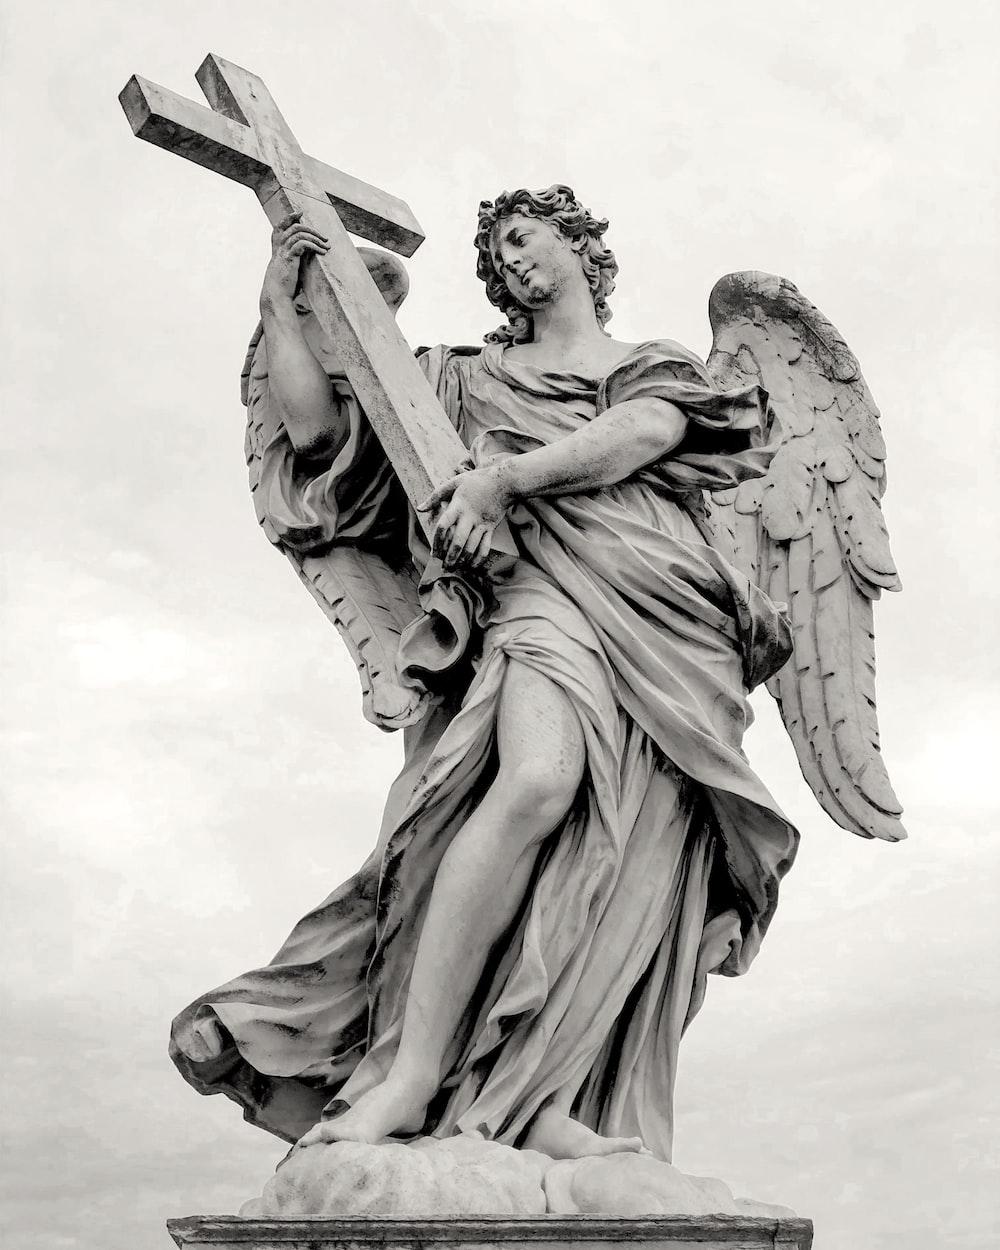 angel statue under white sky during daytime